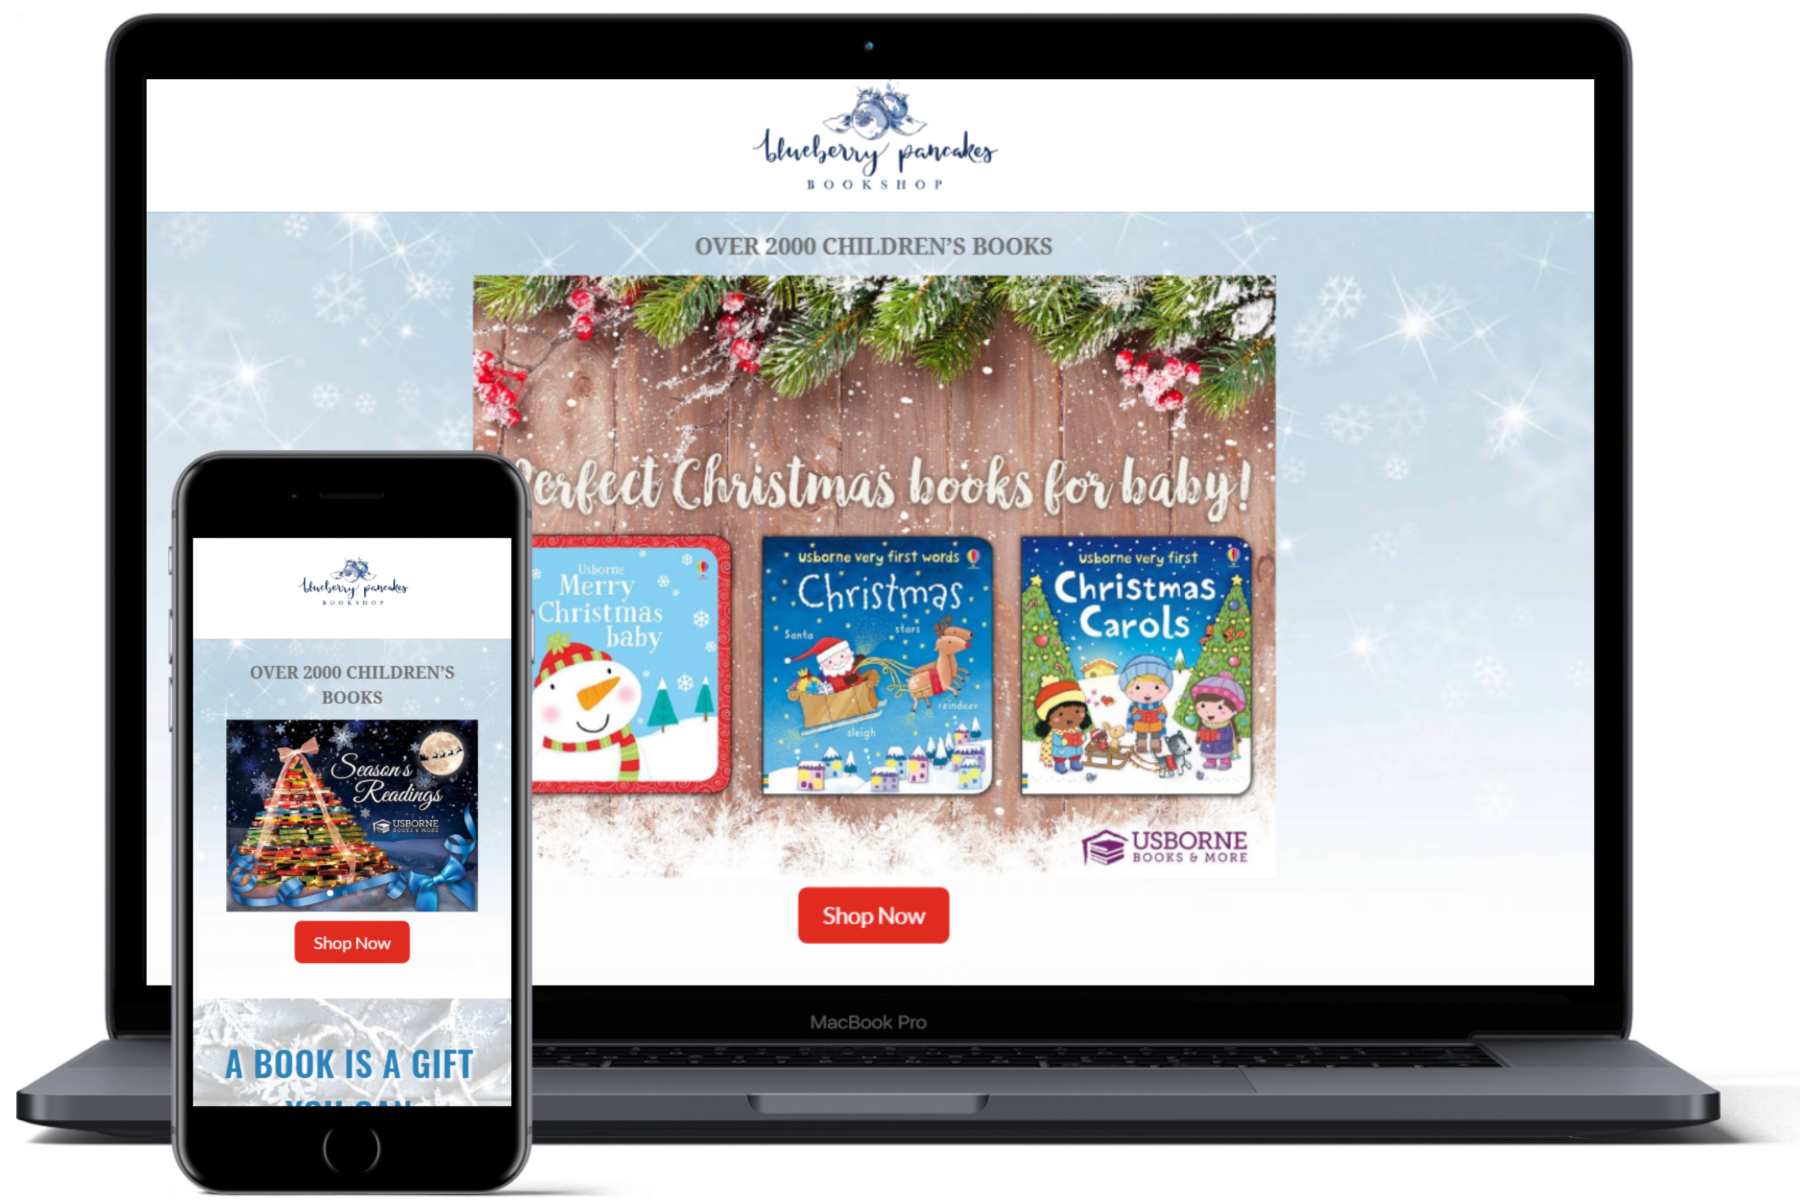 website showcase blueberry